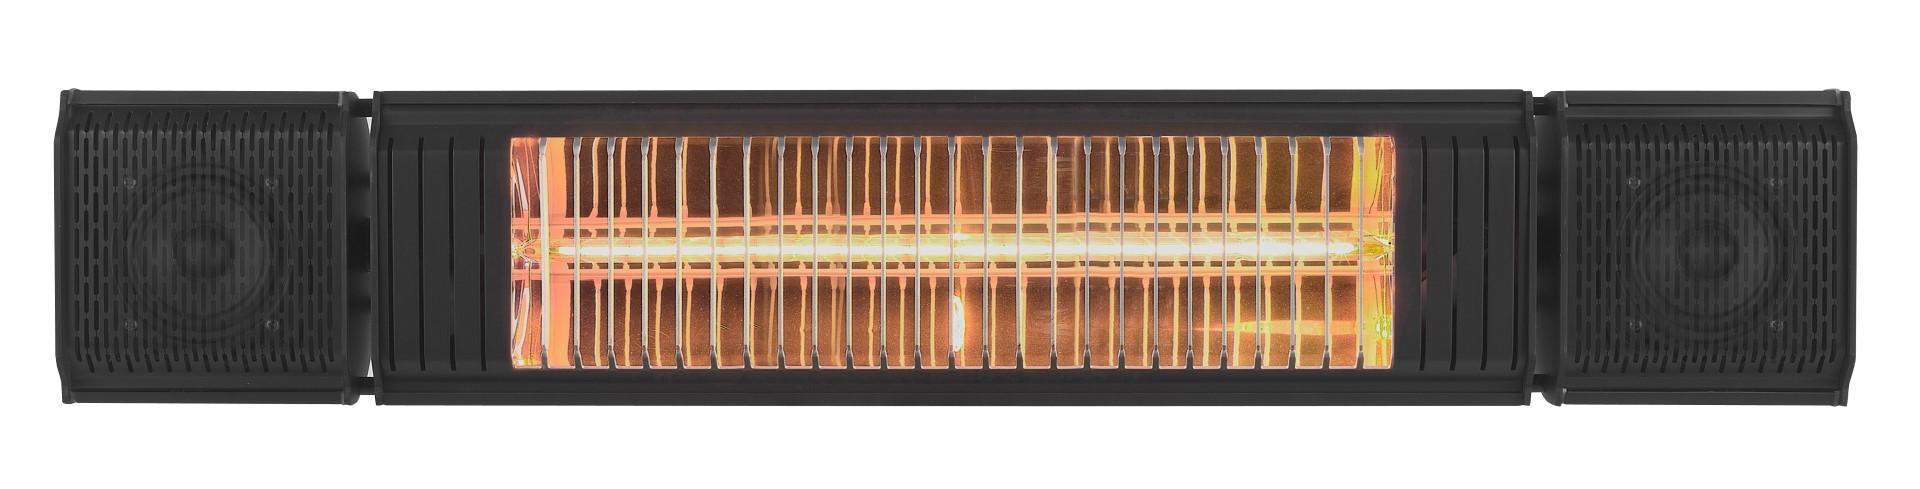 Elektrische terrasverwarmer Heat and Beat Zwart